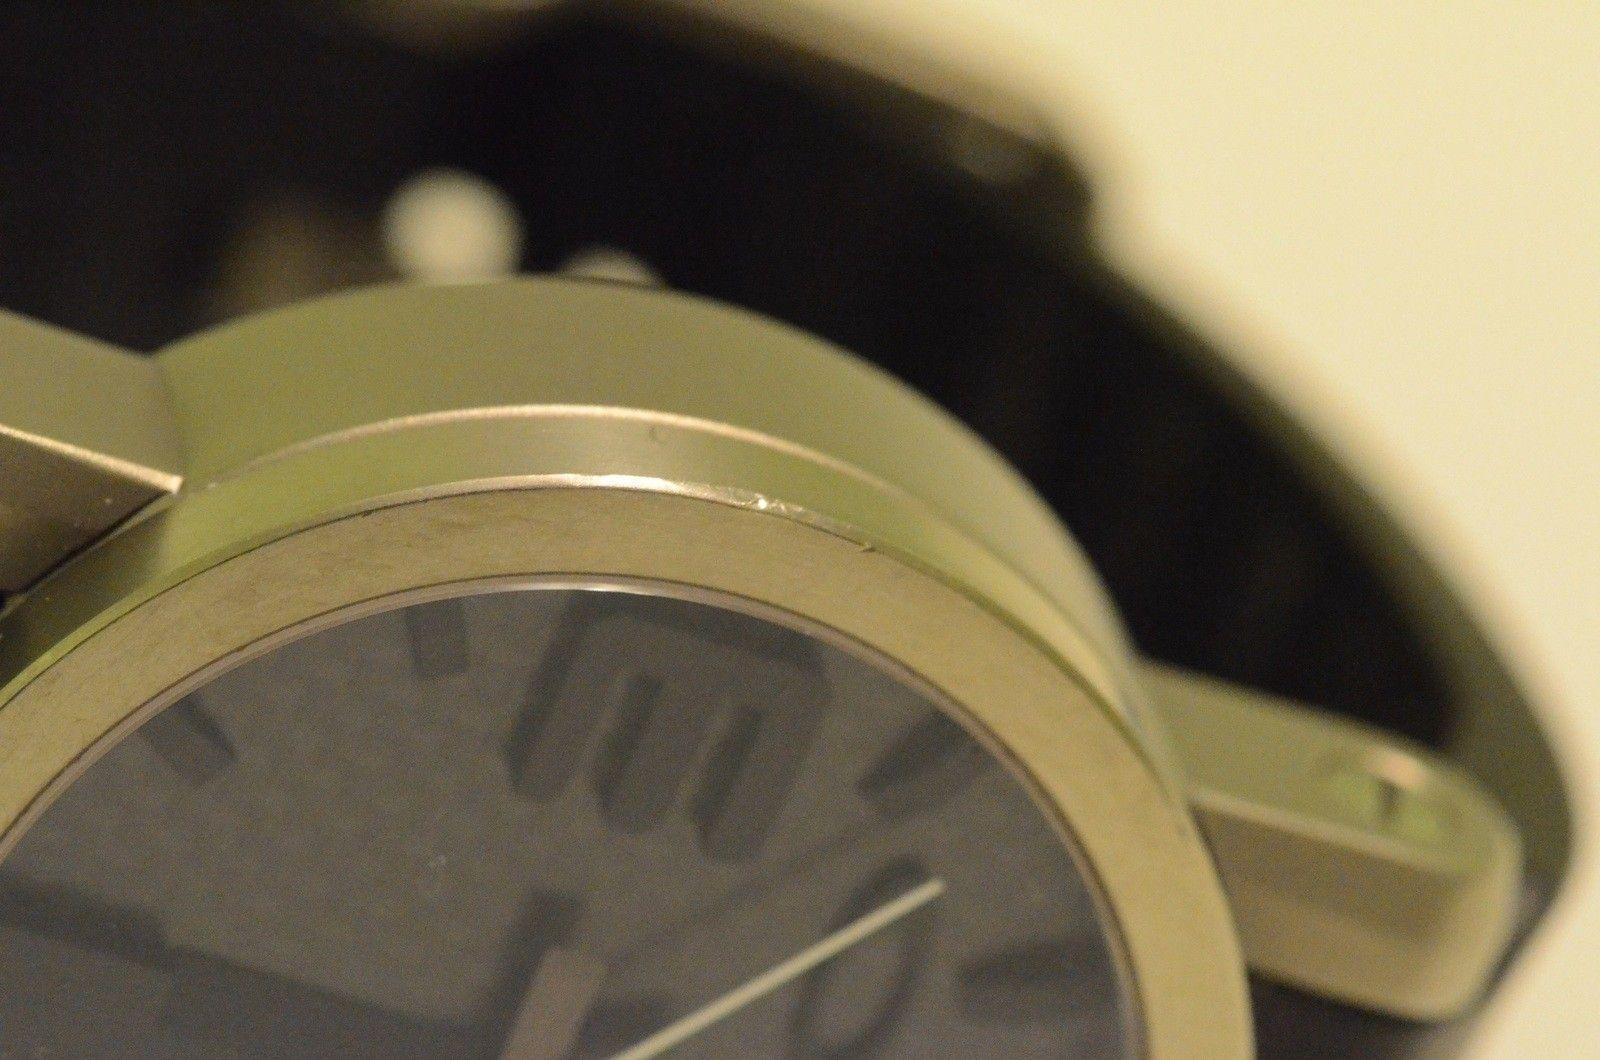 Gearbox Brushed Titanium- Carbon Fiber Dial SOLD! - DSC_0449.JPG